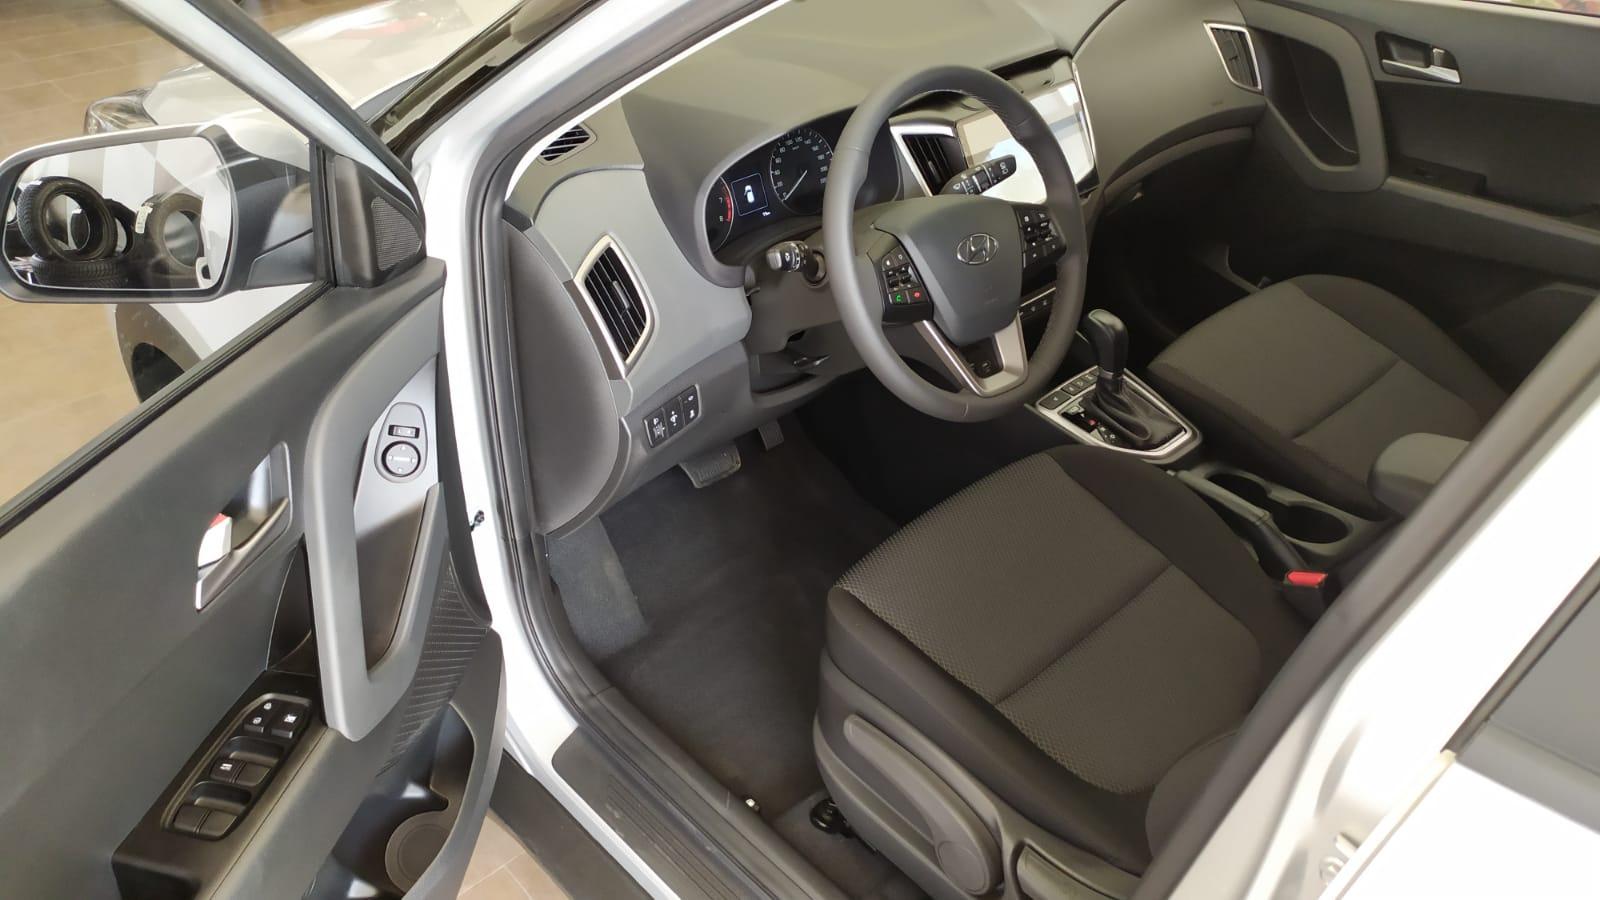 HYUNDAI CRETA 2.0л 6AT 4WD. Travel. Серебристый. 2021